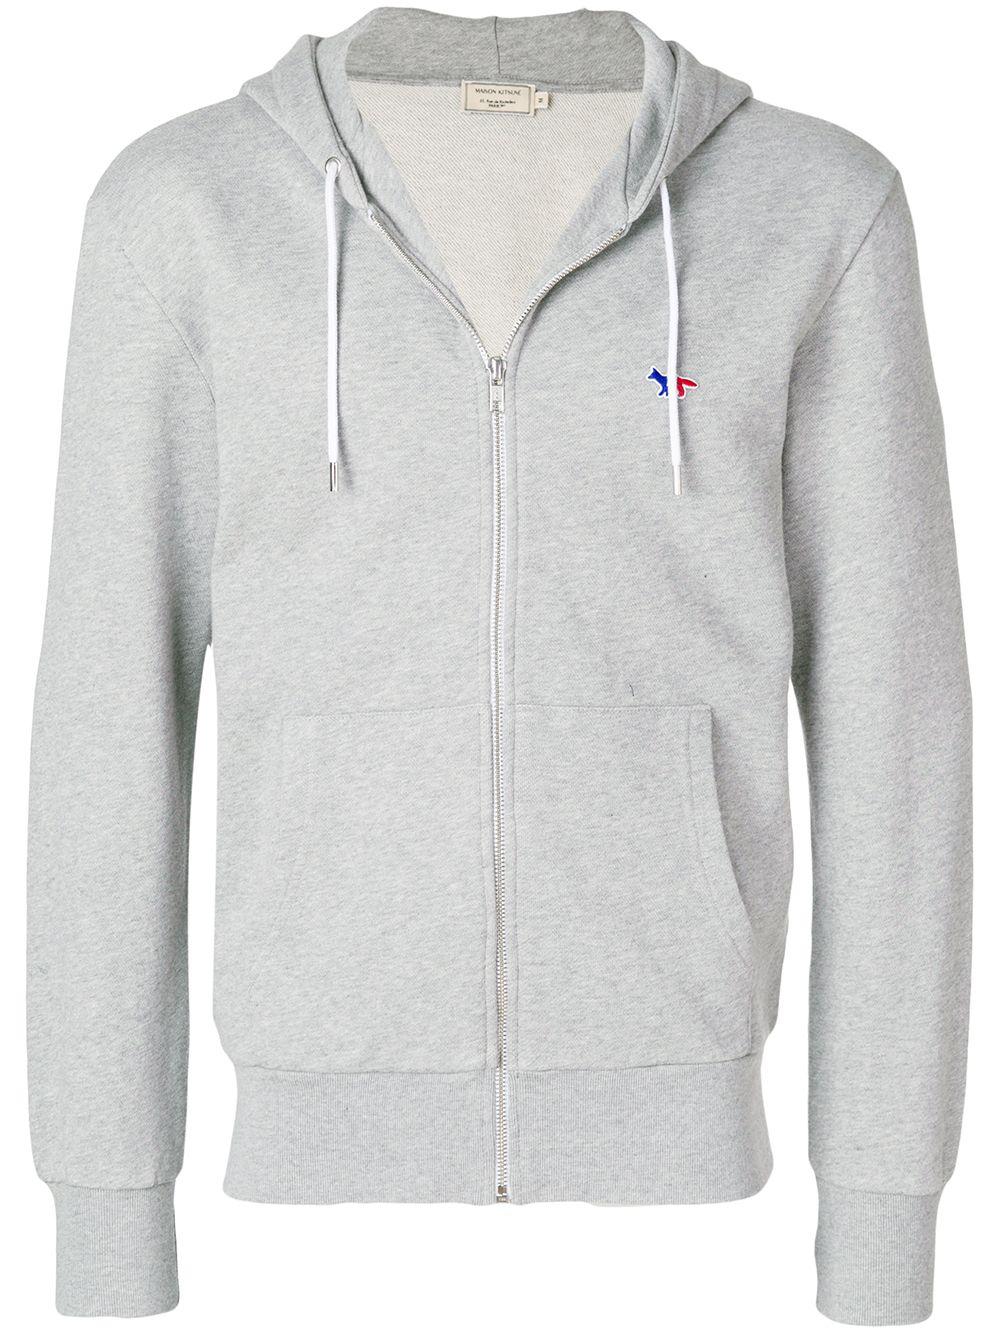 MAISON KITSUNÉ zipup hoodie